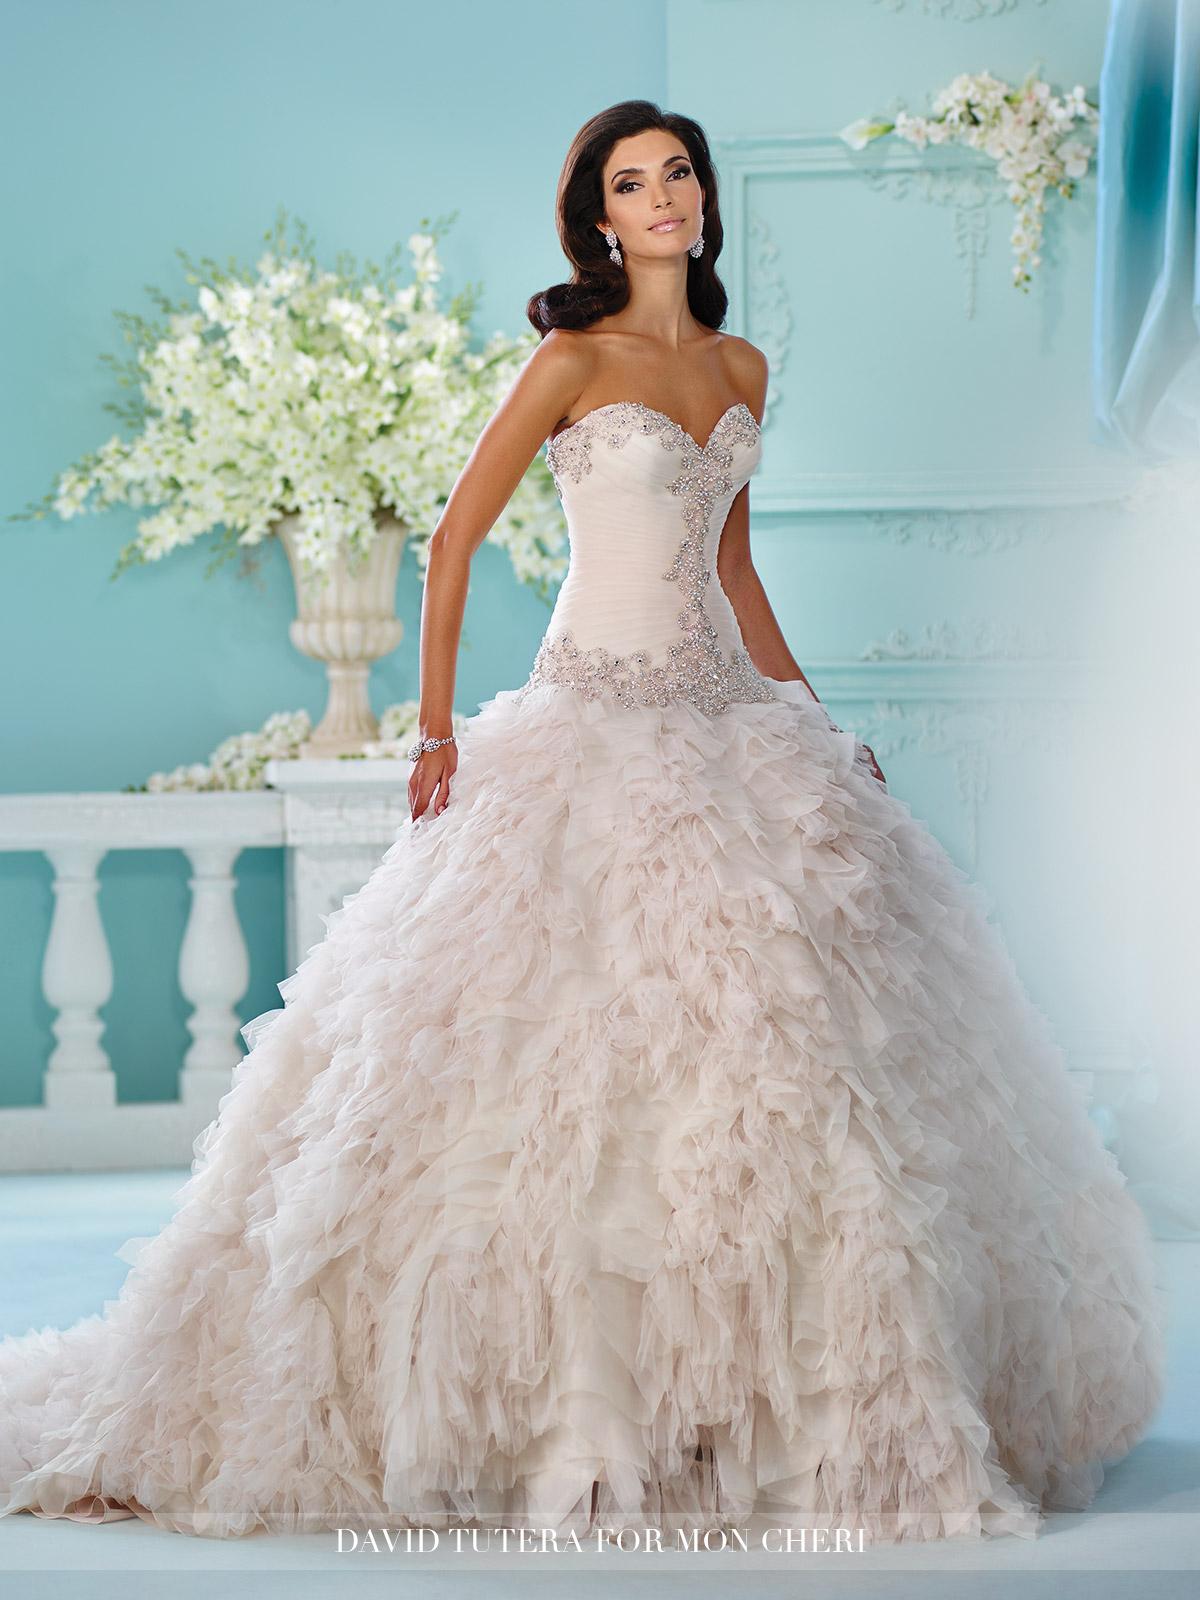 Magnificent Dropped Waist Wedding Dresses Photos - All Wedding ...